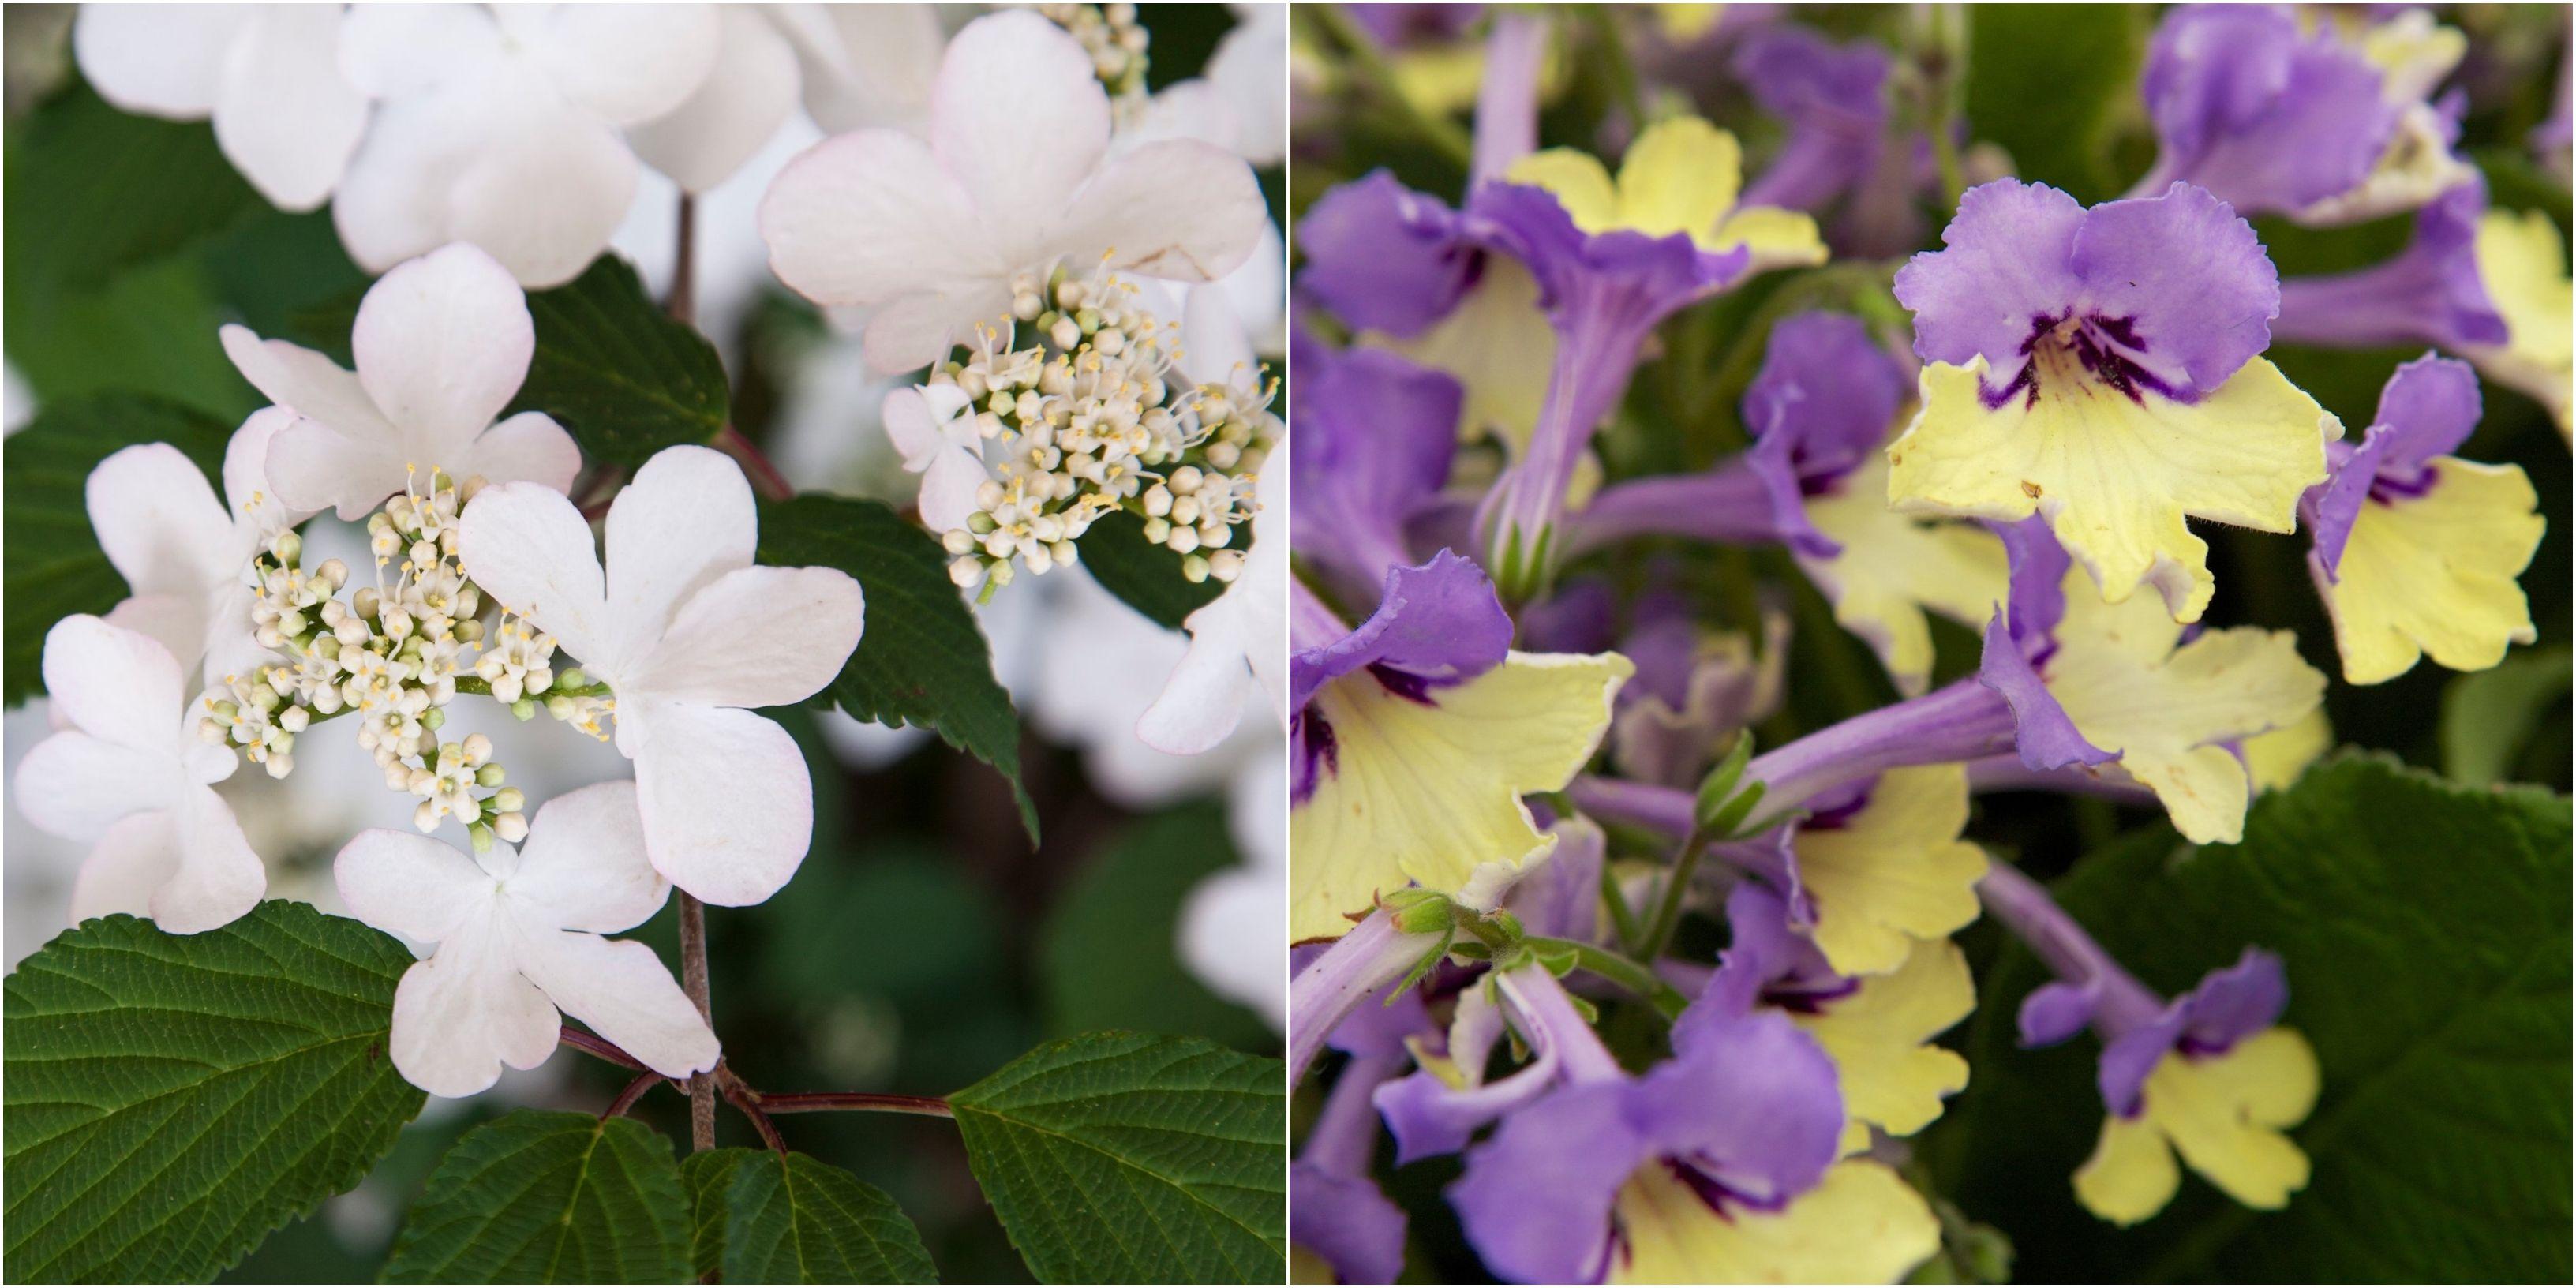 Chelsea Flower Show's Plant of the Decade winner revealed